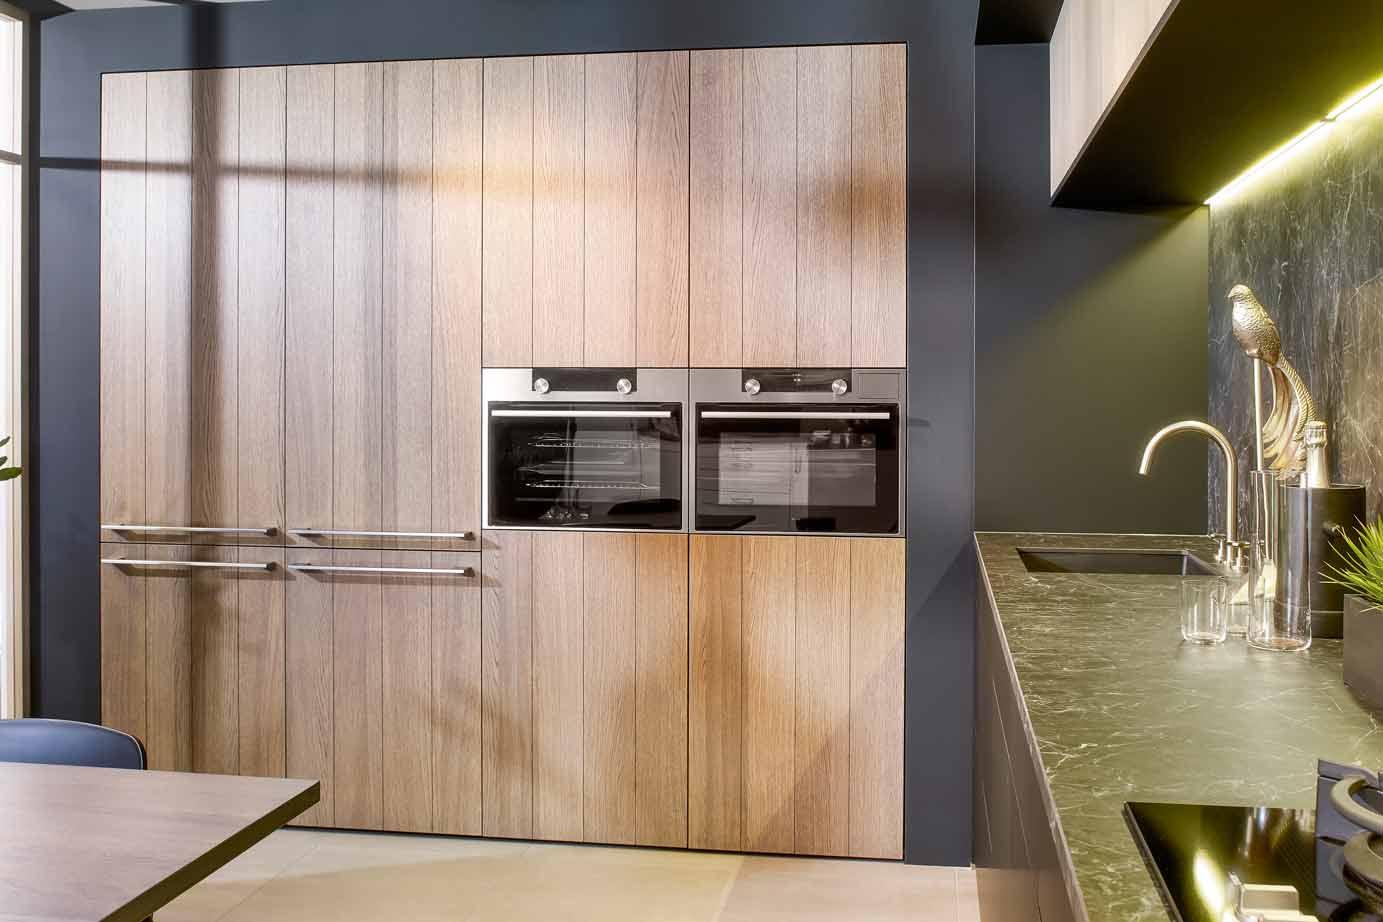 Chique Industriele Keuken : Chique keuken bekijk deze opstelling incl prijzen db keukens